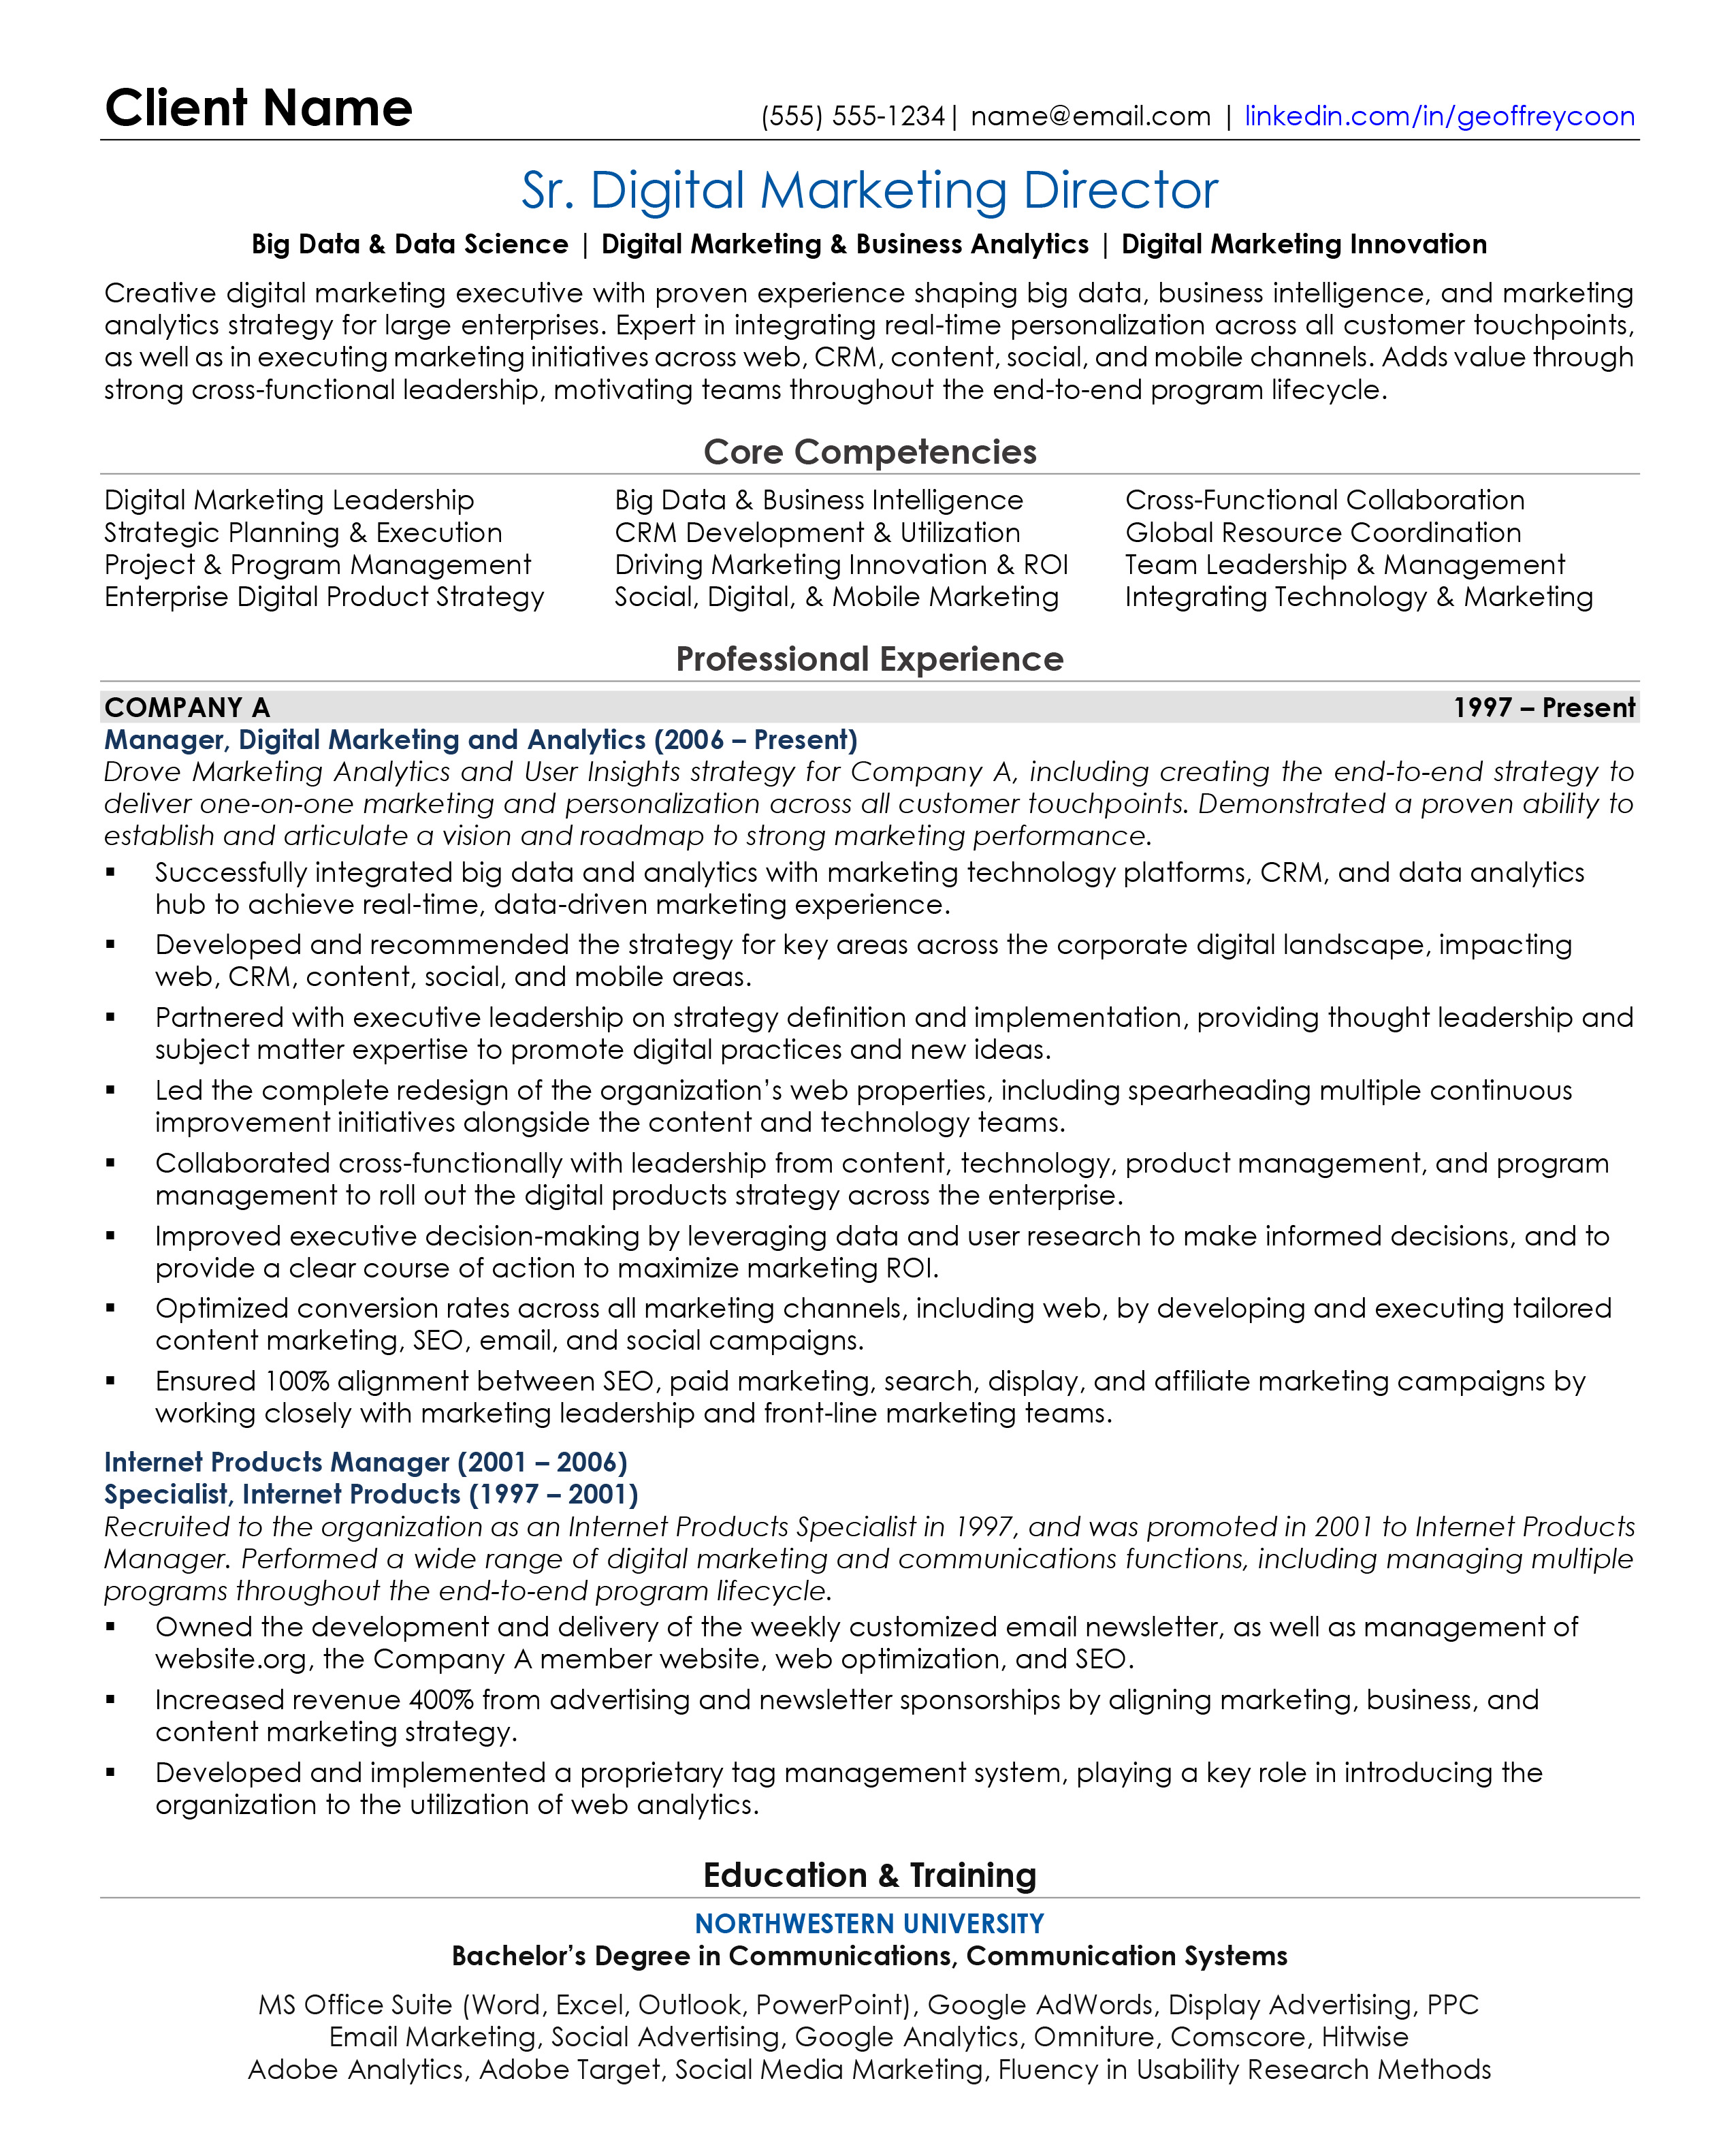 Sample Resume – RP Career